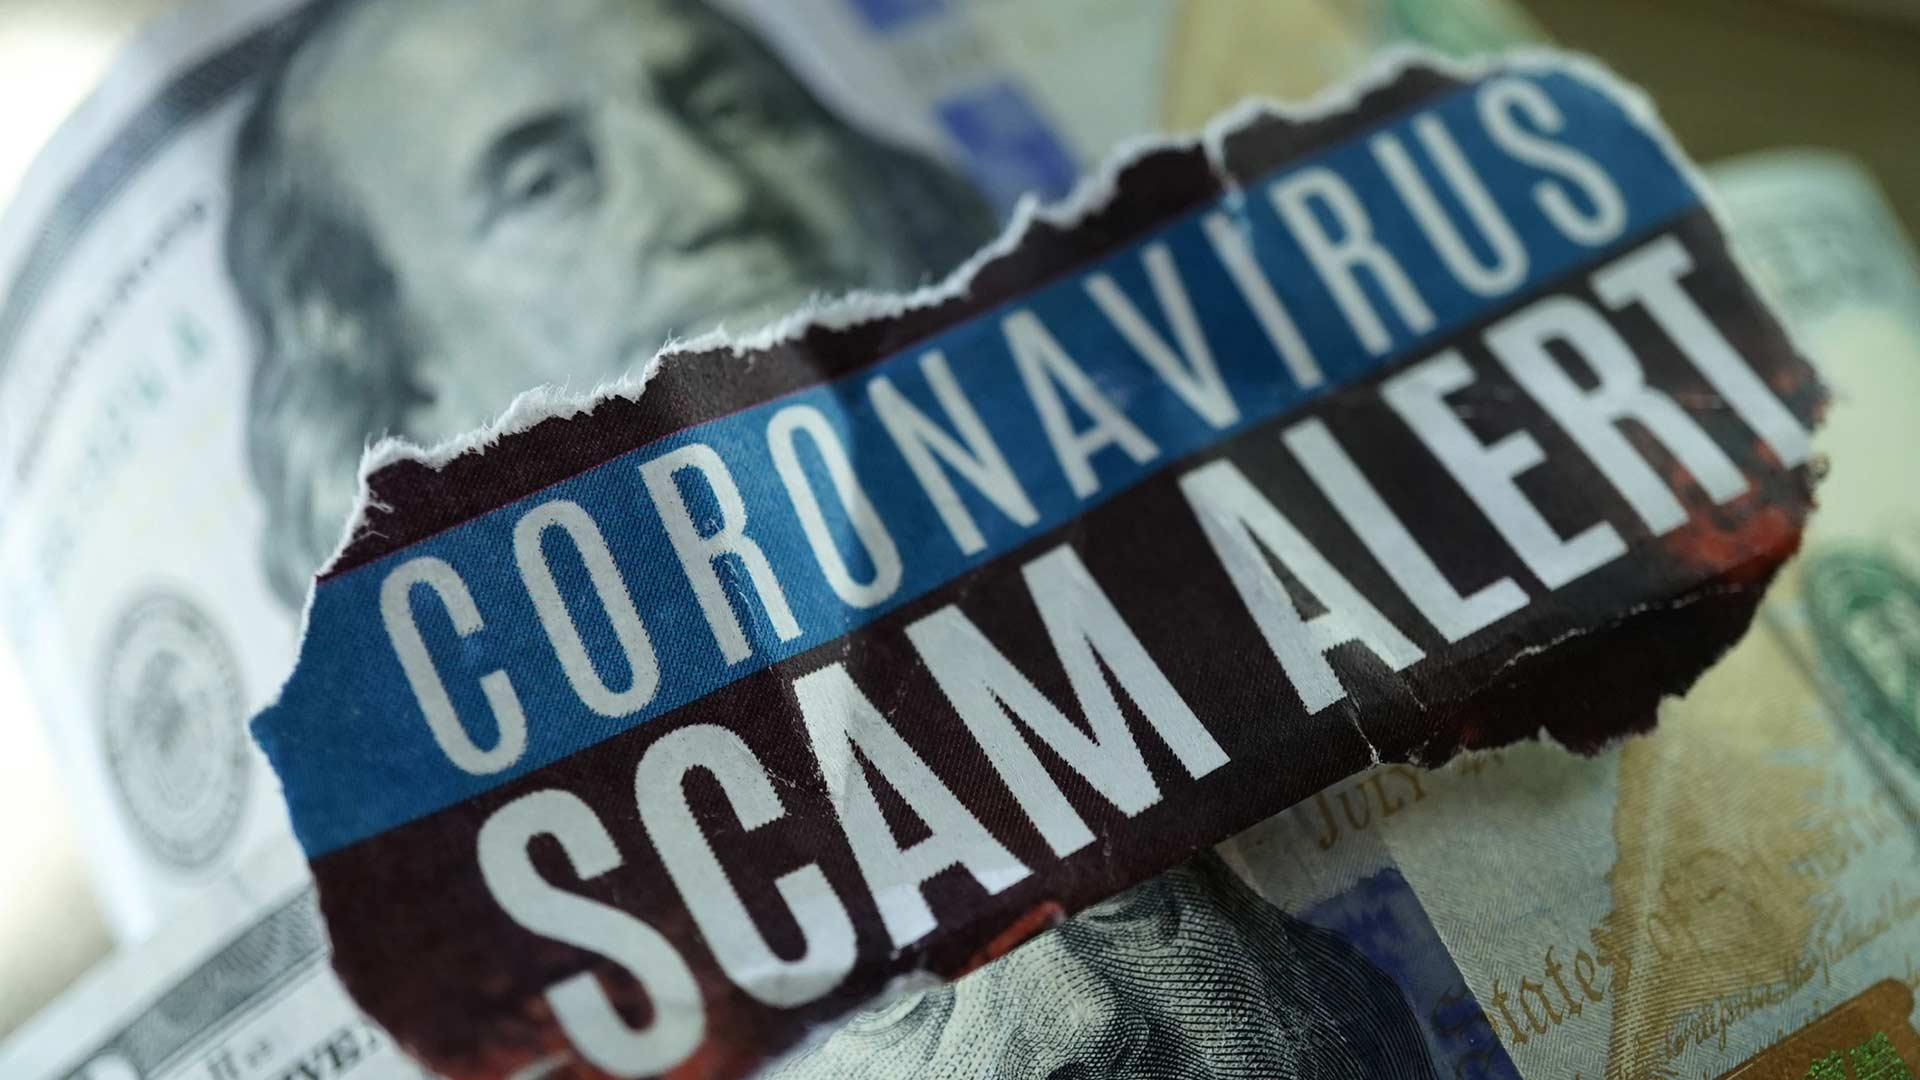 Coronavirus scam alert on dollar bill